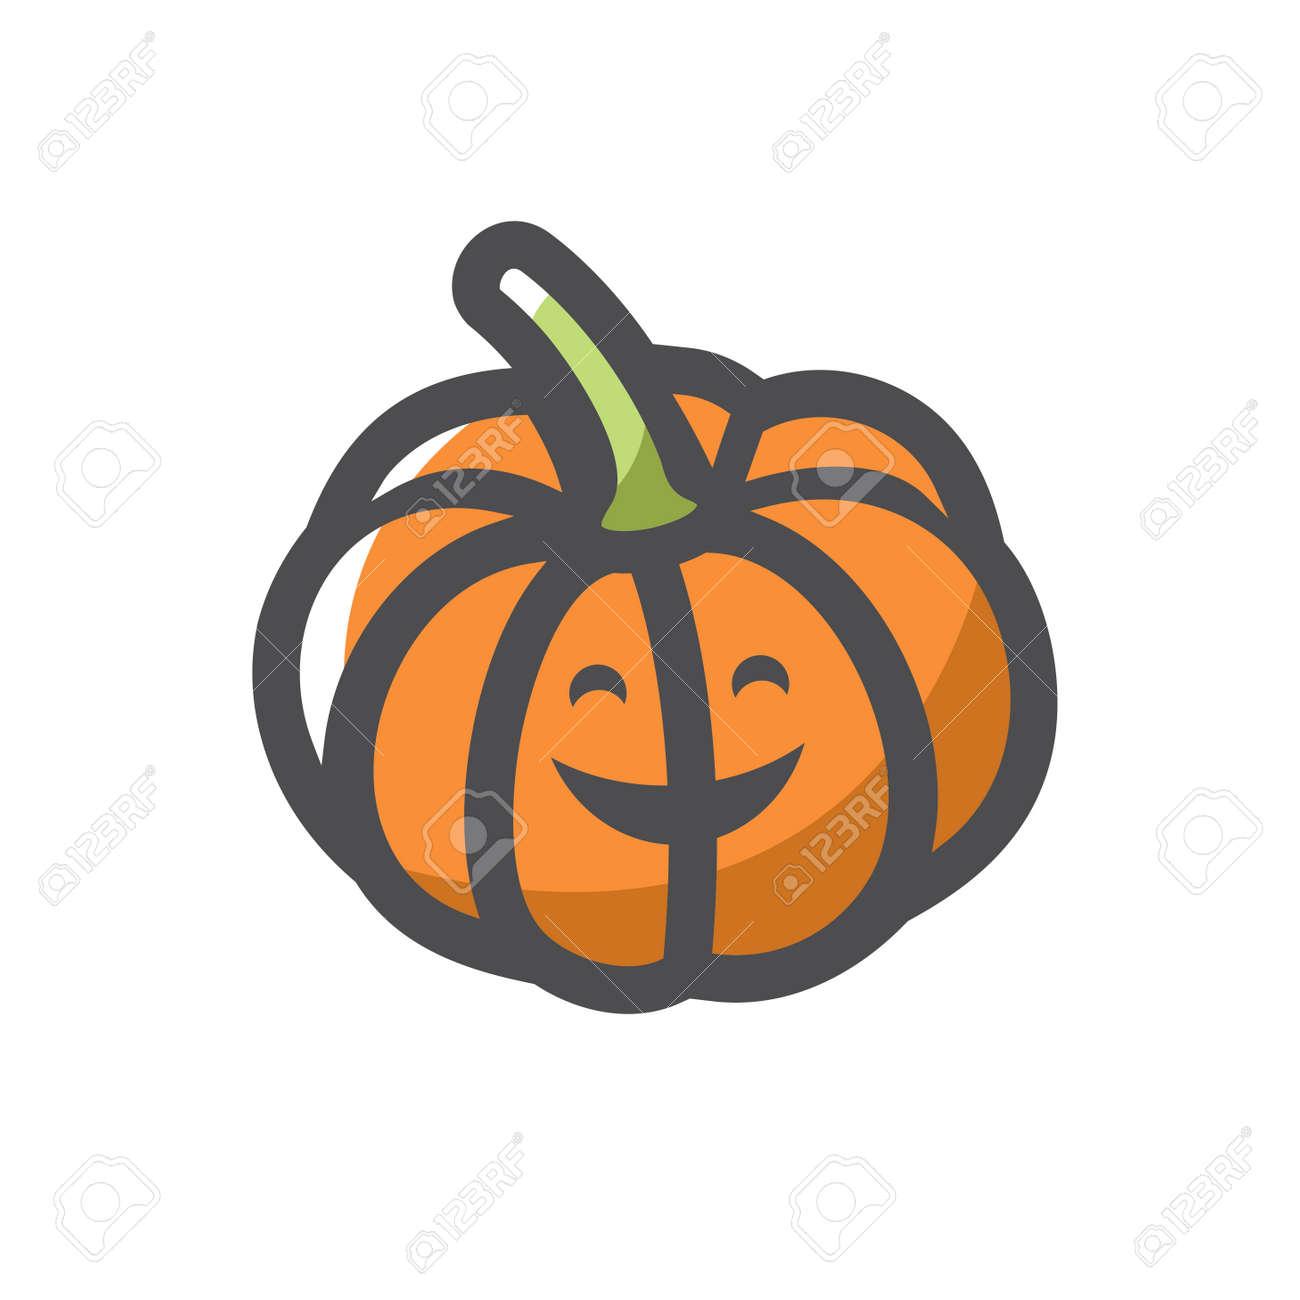 Pumpkin Gourd Vegetable Vector icon Cartoon illustration. - 169914204